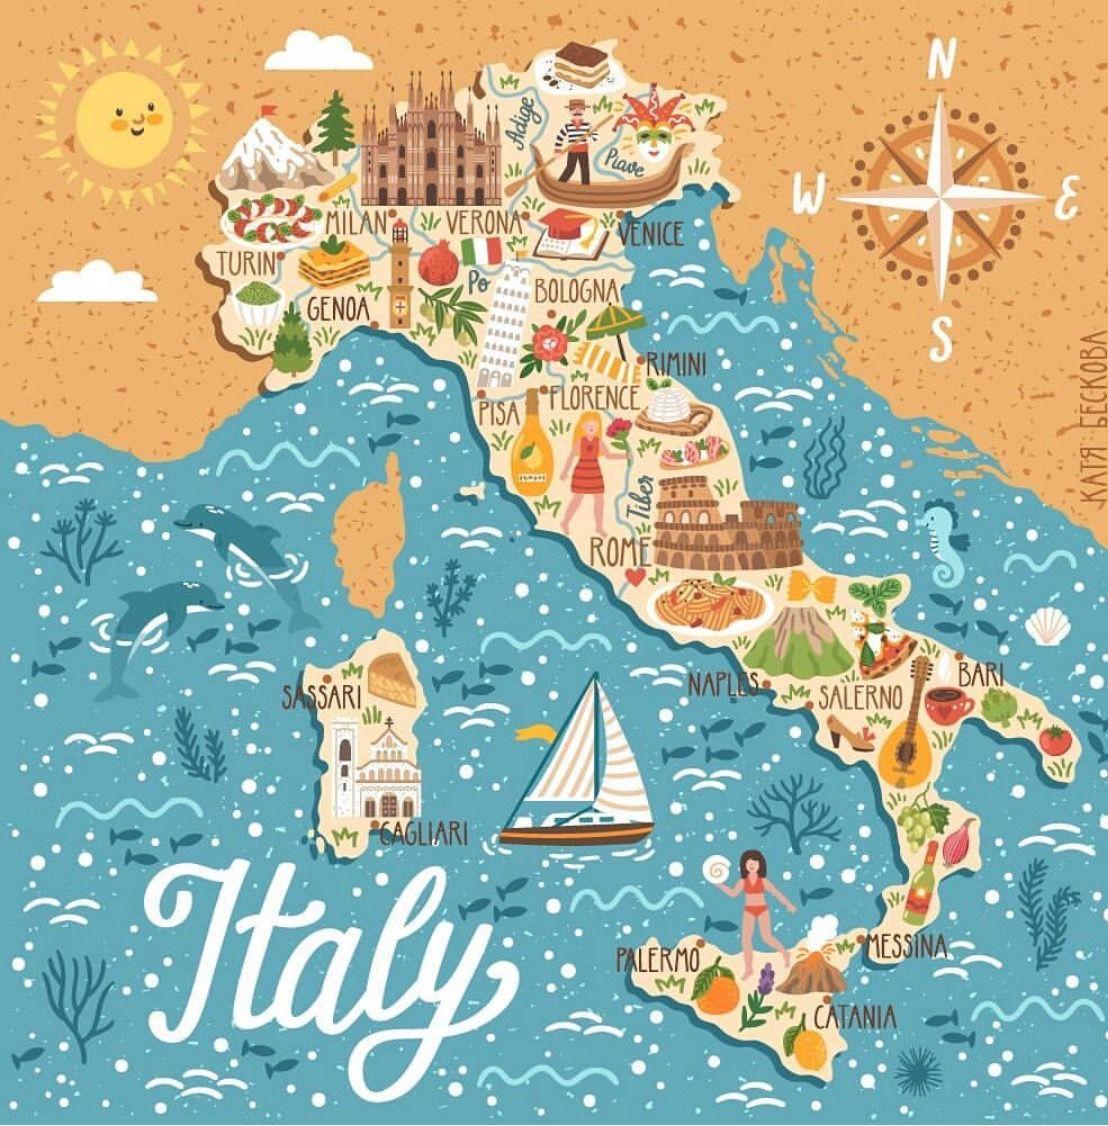 Italien Italy Map Travel Symbols Illustrated Map